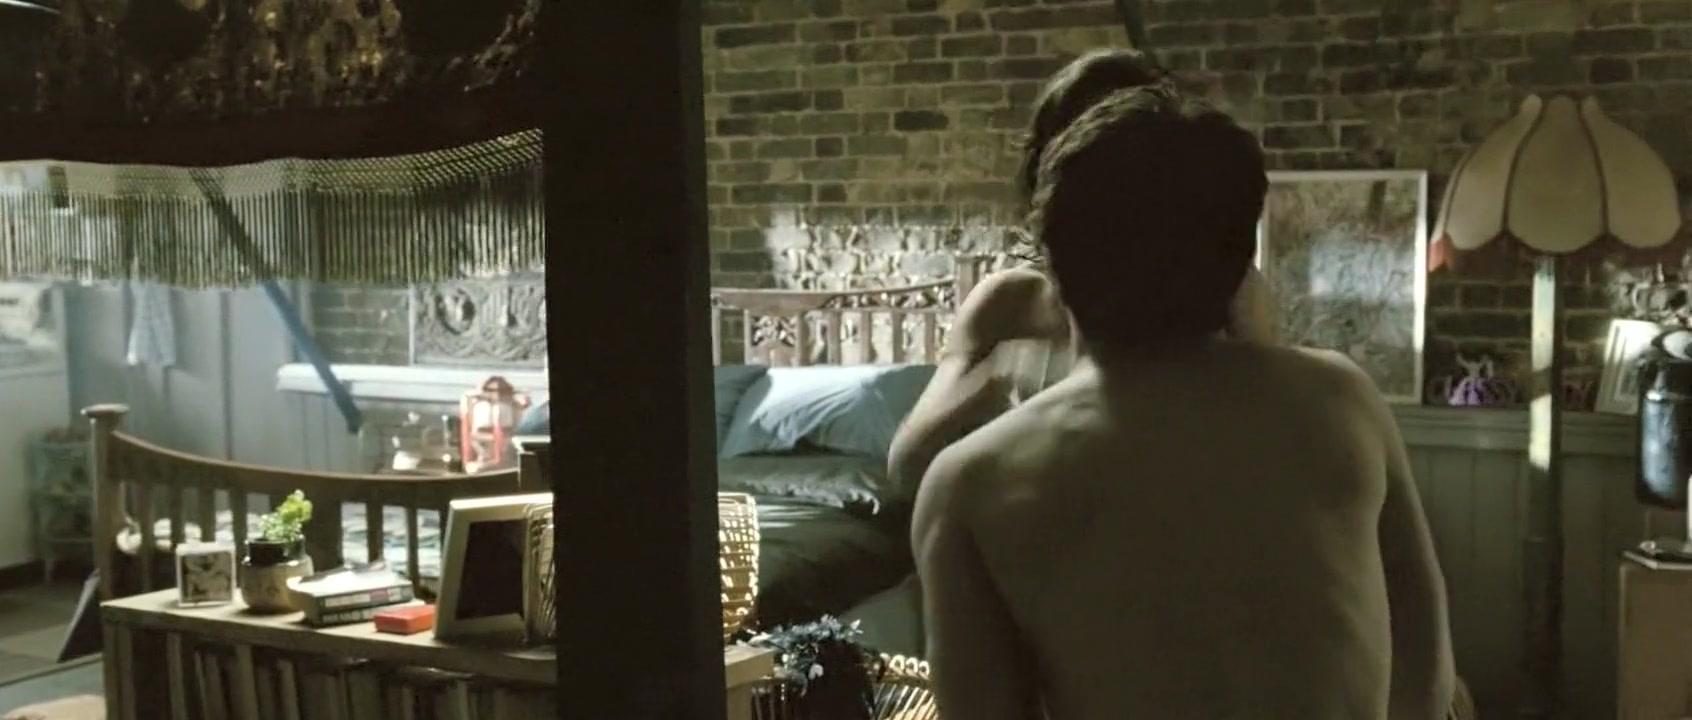 Naked 18+ Gallery Kargi cudi da boroti online dating